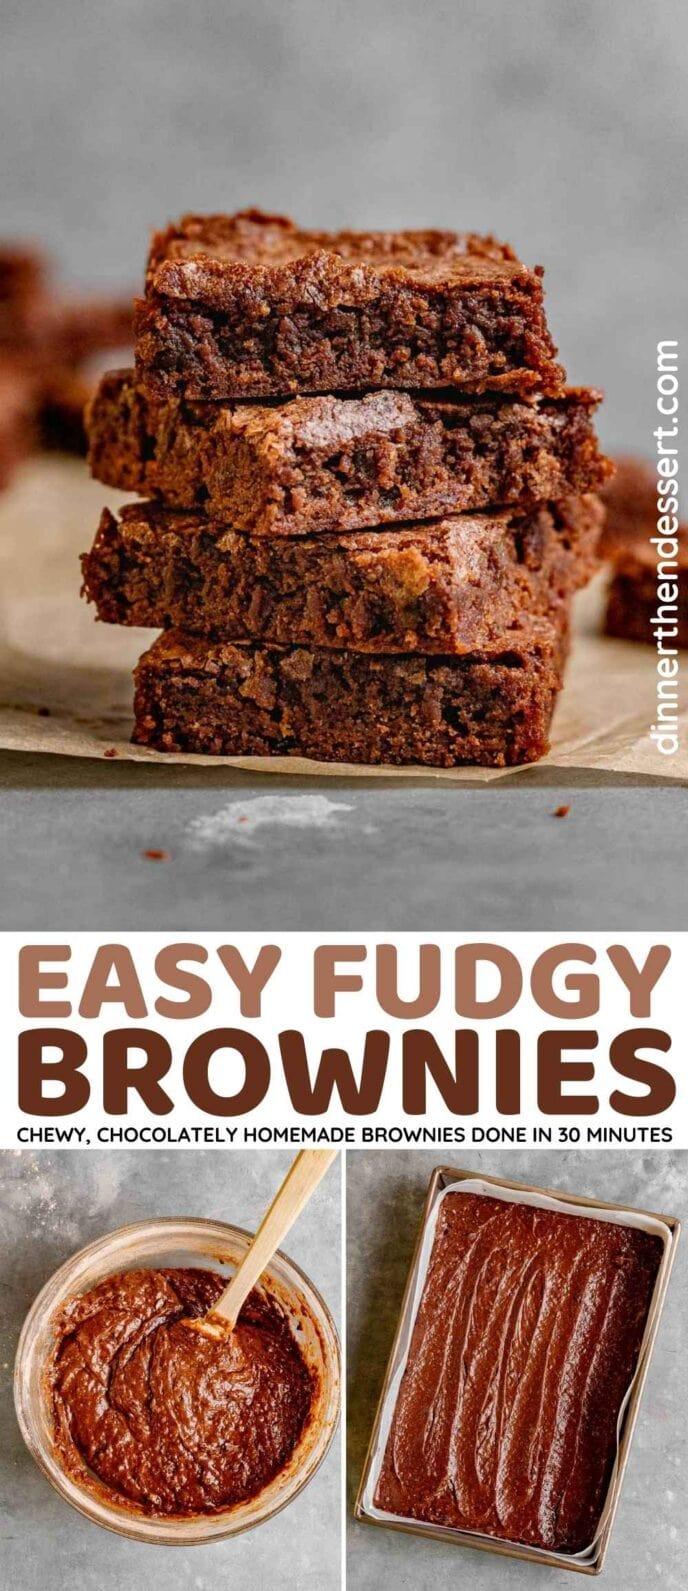 Fudgy Brownies Collage